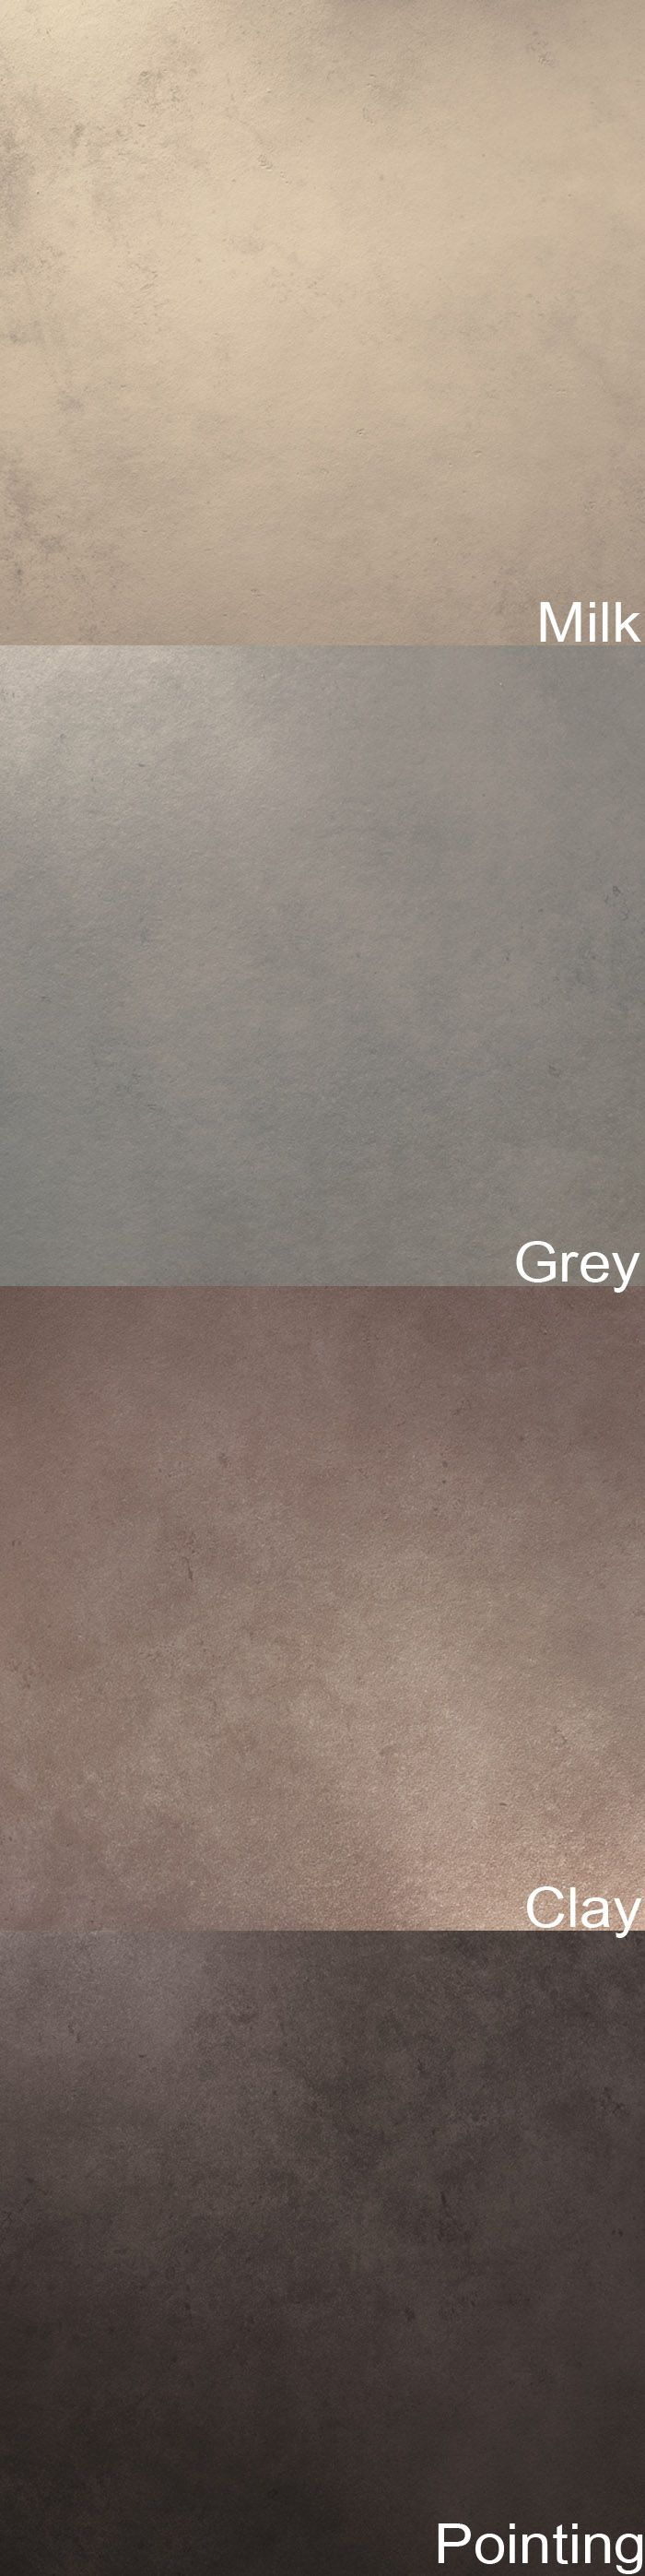 UNIT www.brixweb.com #brix #tile #tiles www forgiarini.net